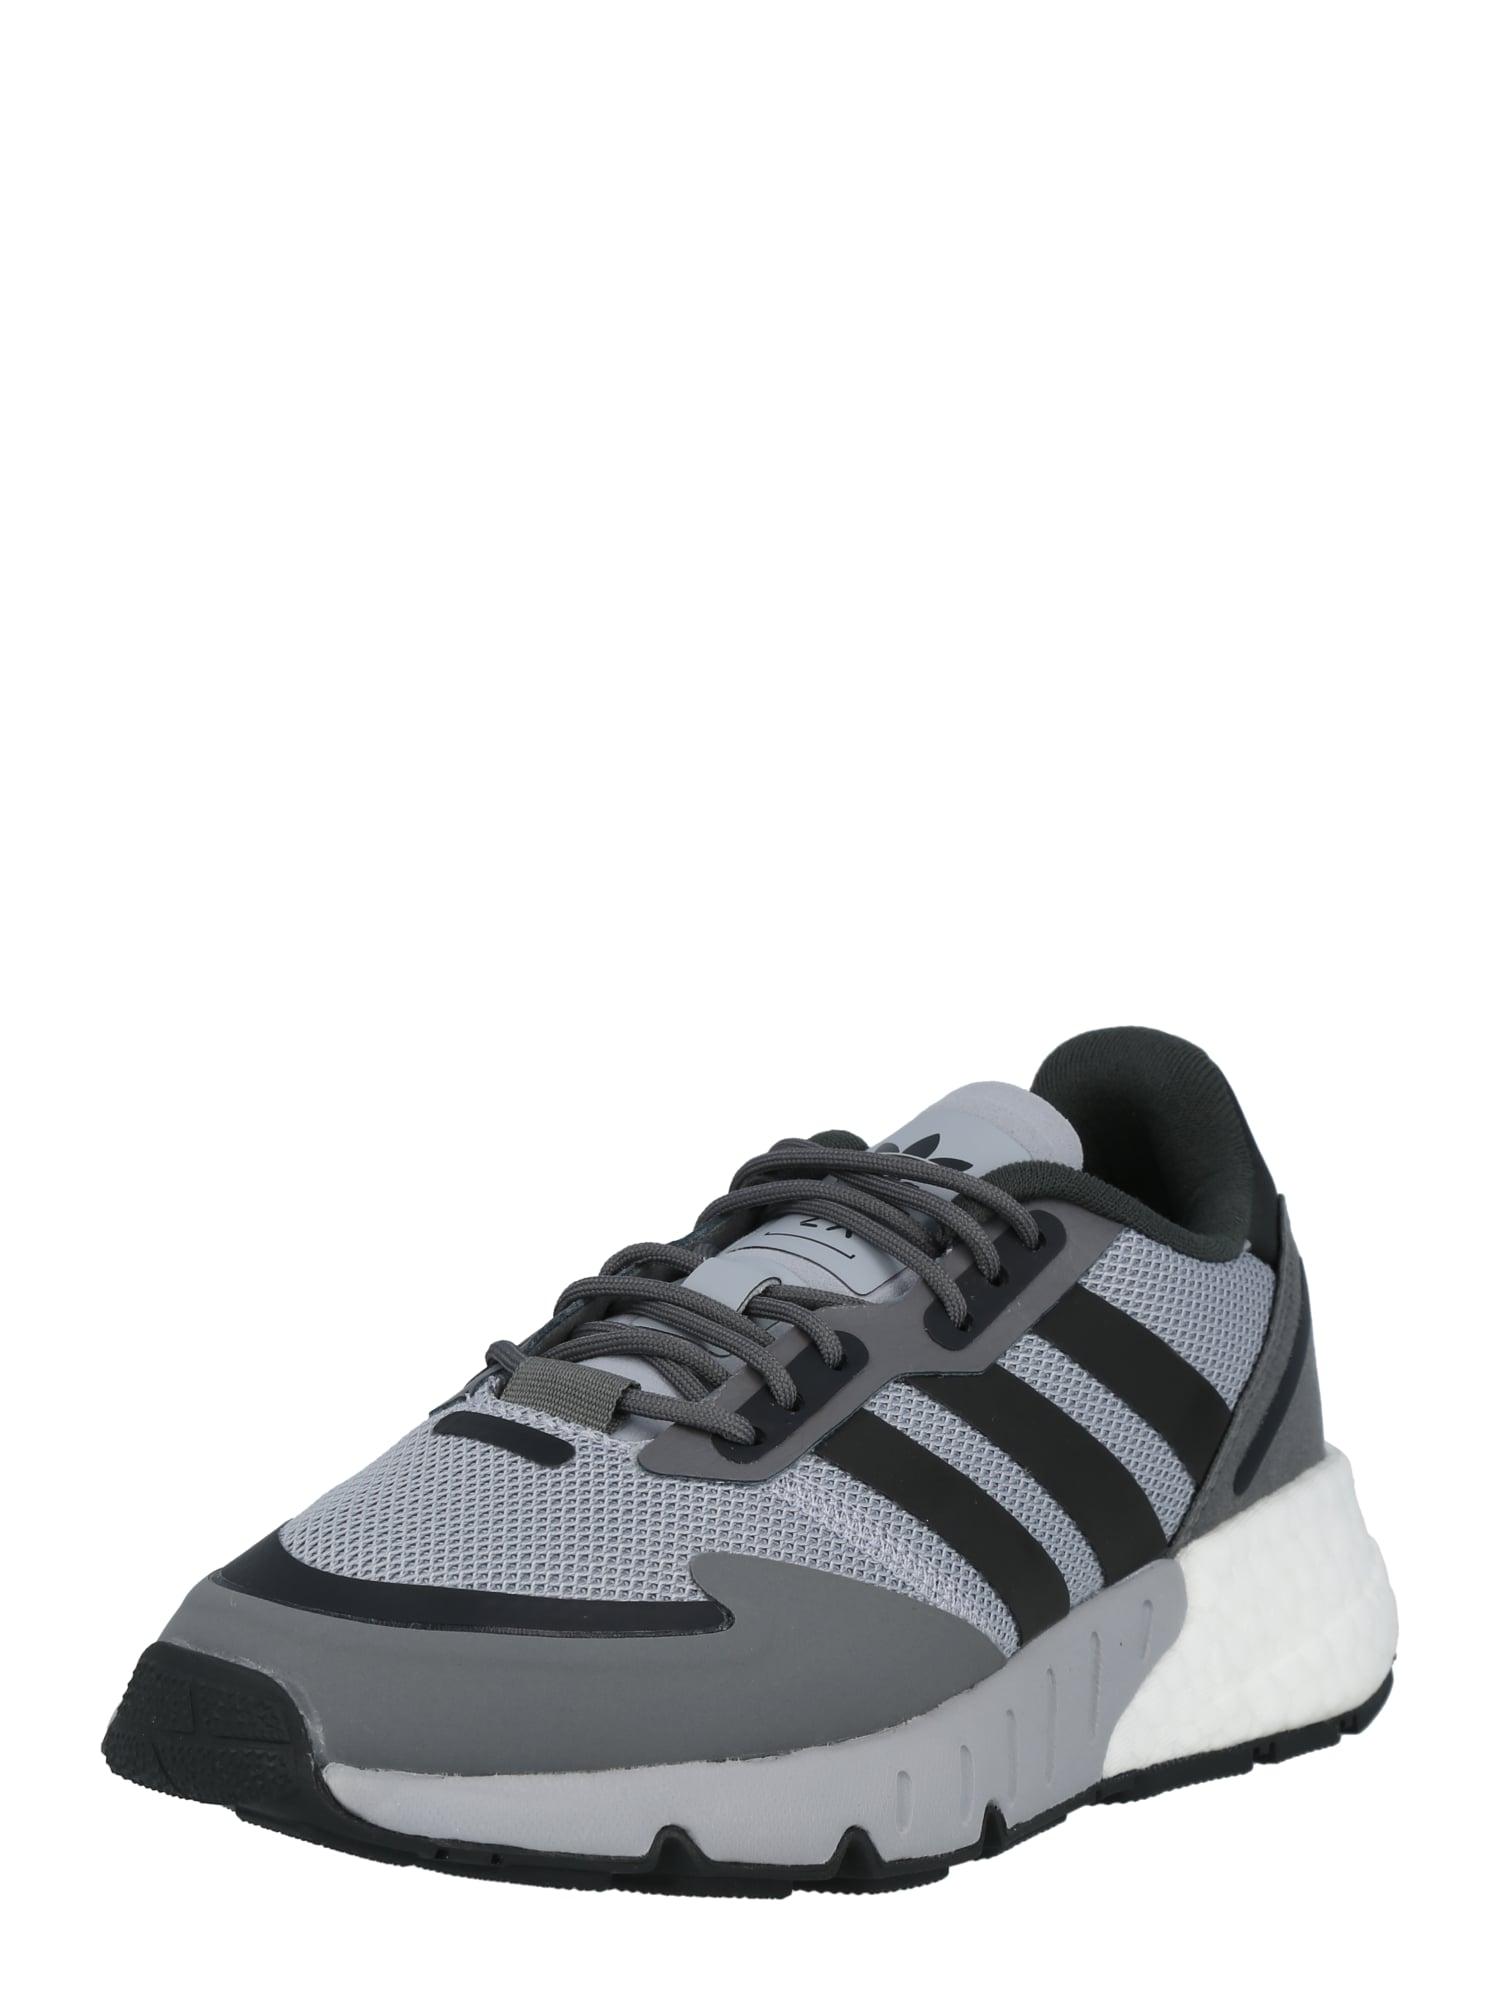 ADIDAS ORIGINALS Tenisky  světle šedá / černá